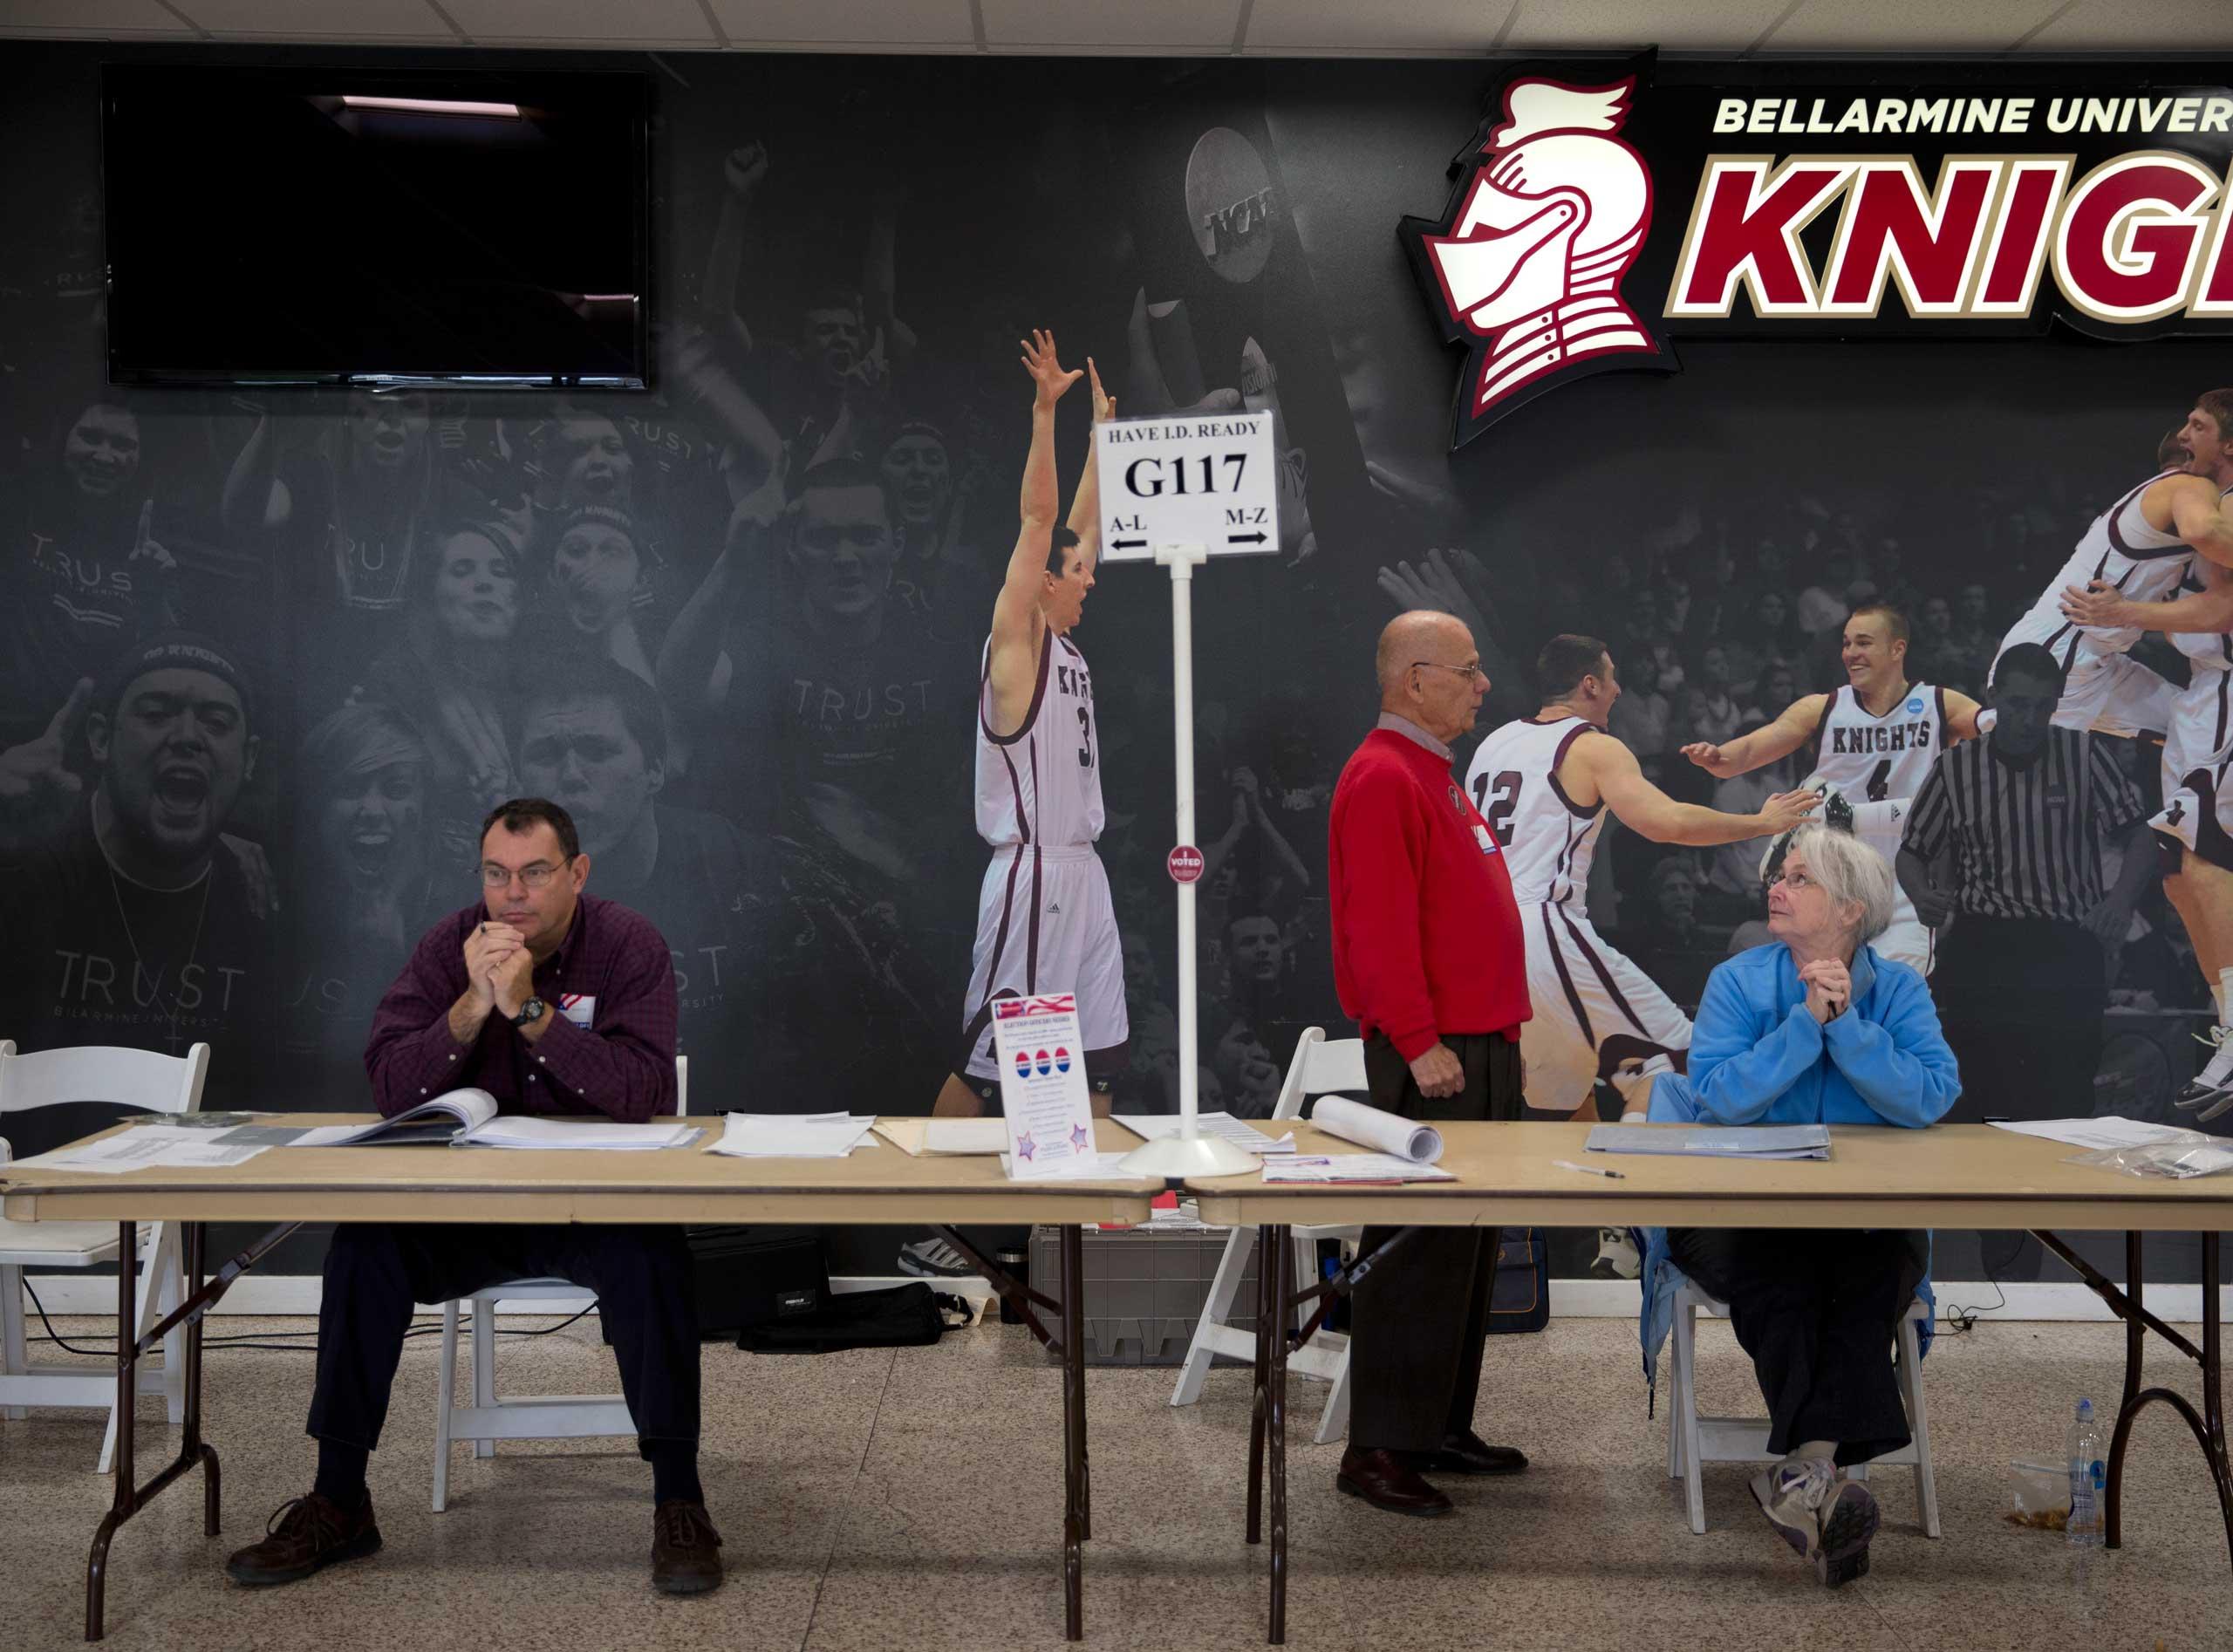 Officials help facilitate midterm election voting at Bellarmine University Knights Hall Hallway, Louisville, Ky. on Nov. 4, 2014.